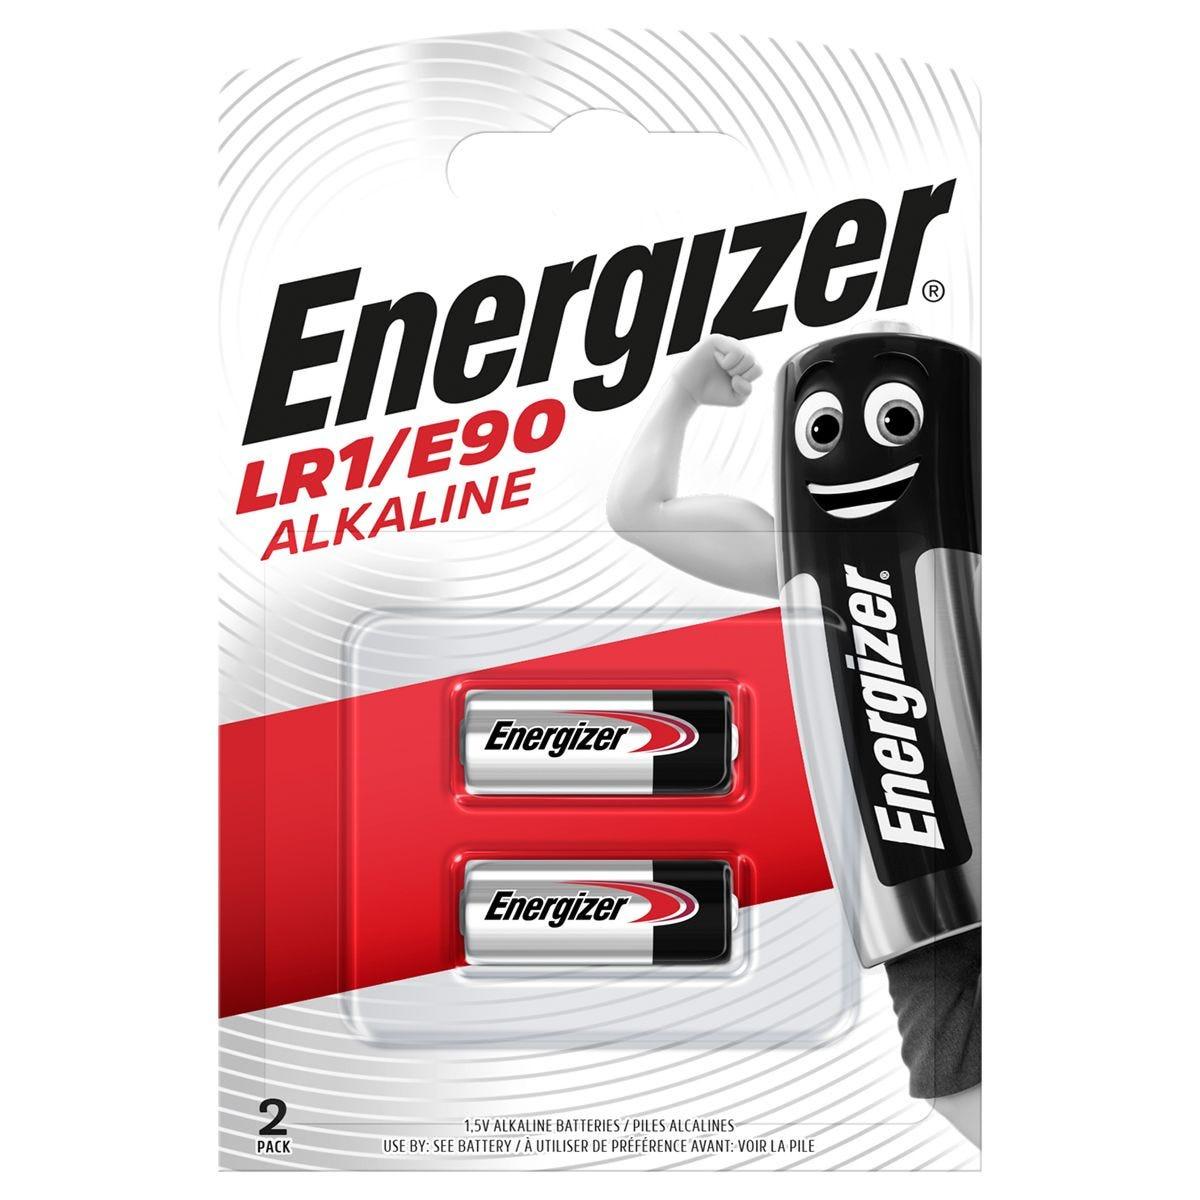 Energizer E90 Battery - 2 Pack